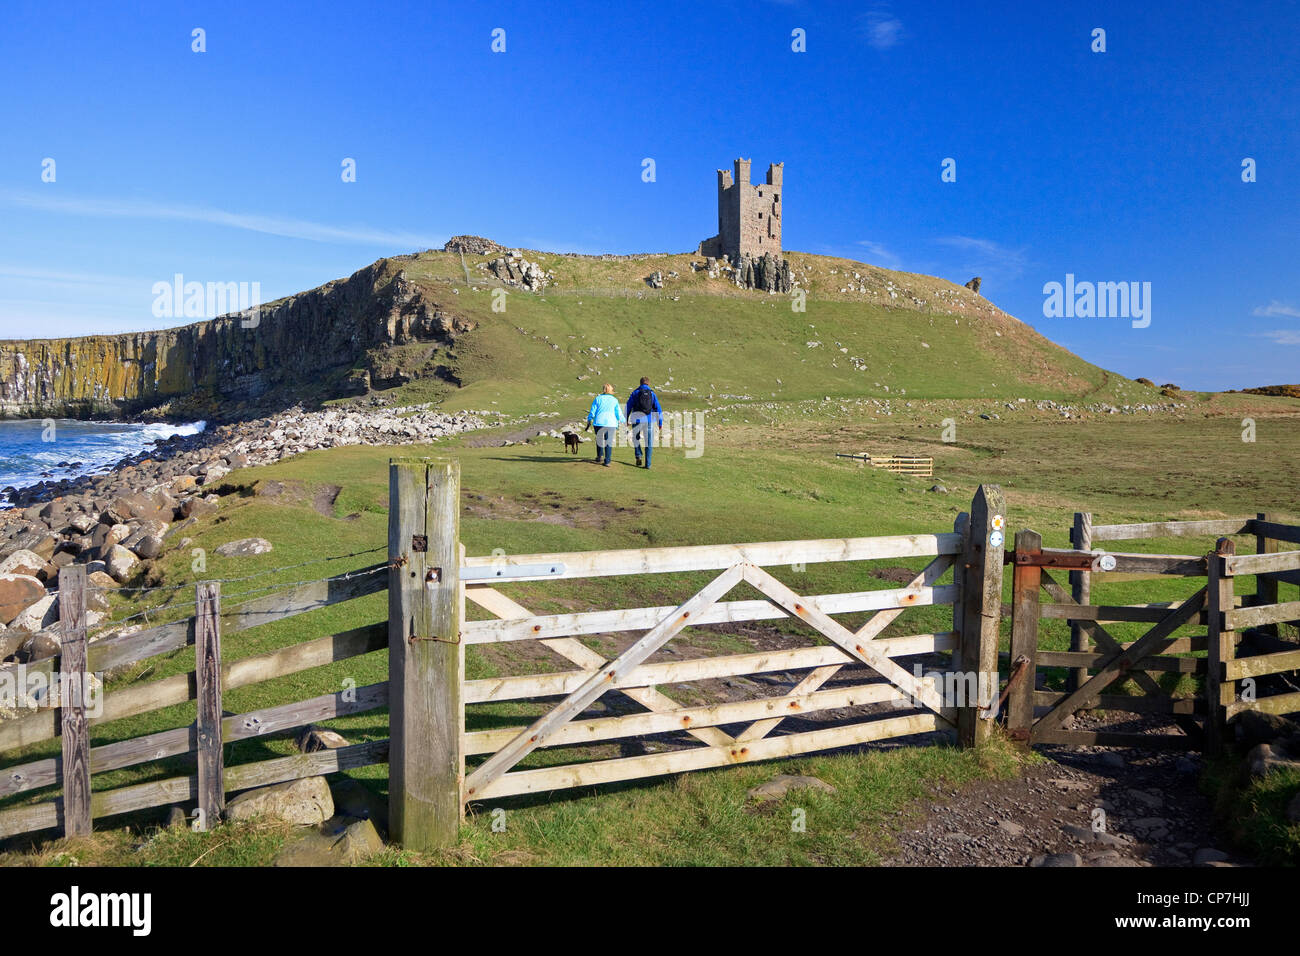 Man and woman walking on the English Coastal Walking route at Dunstanburgh Castle, Northumberland, England, UK, - Stock Image